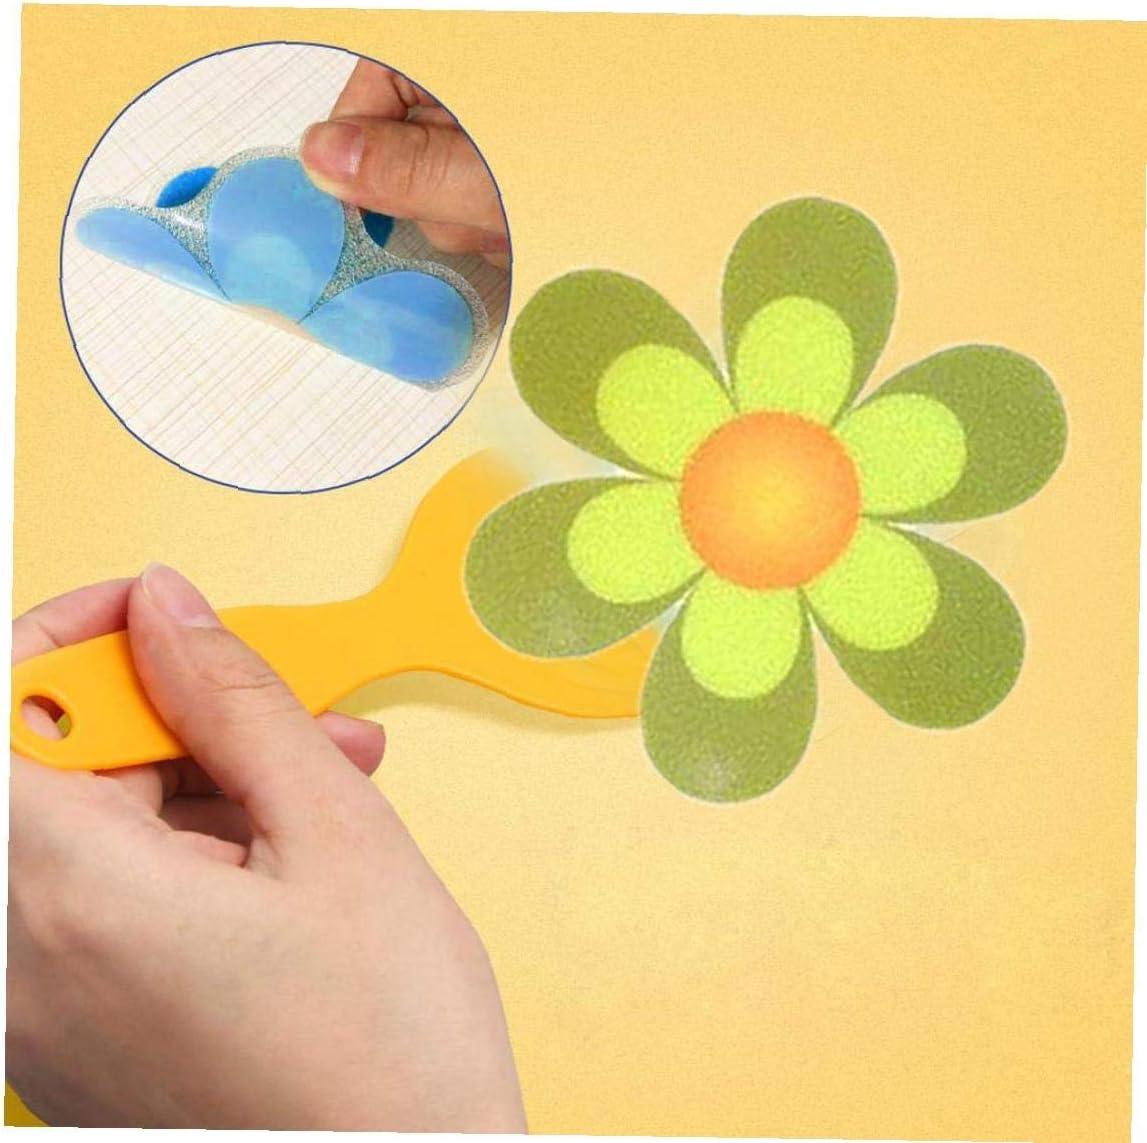 Non Slip Bathtub Shower Anti Slip Sticker Adhesive Wall Decals Bright Colors Large Anti Slip Mat Bathroom Sticker